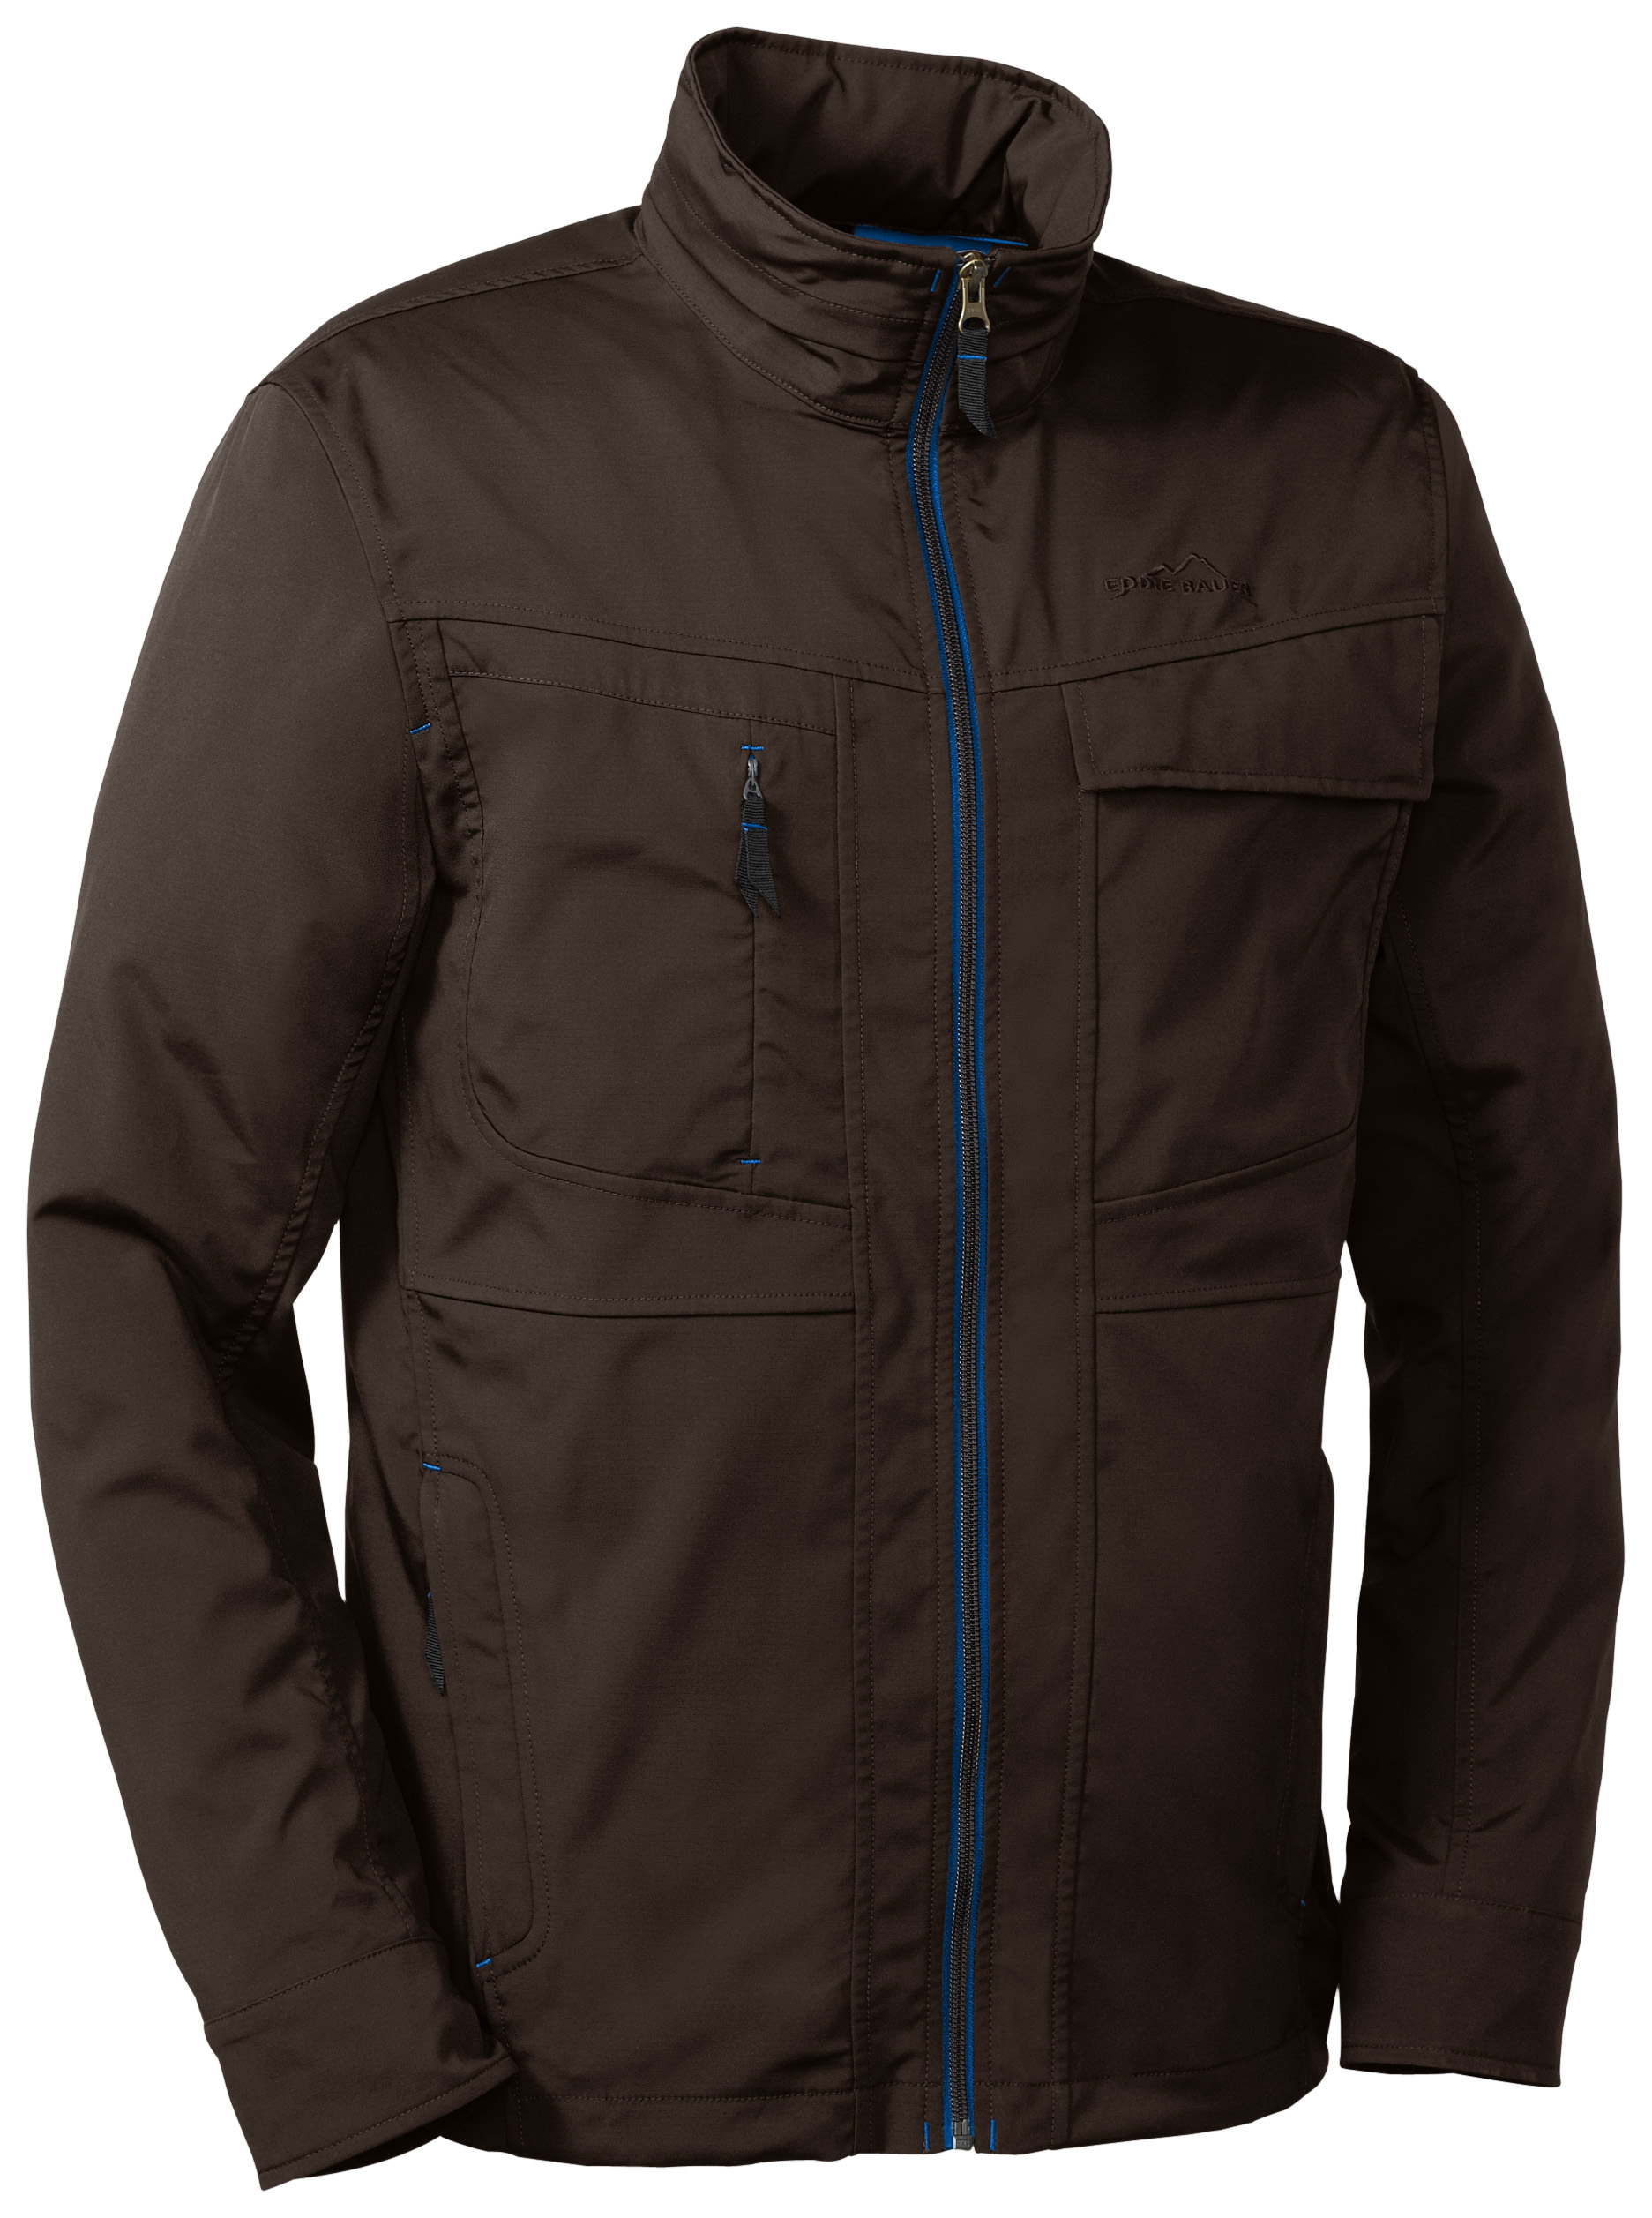 Men's Travexr Soft Shell Jacket